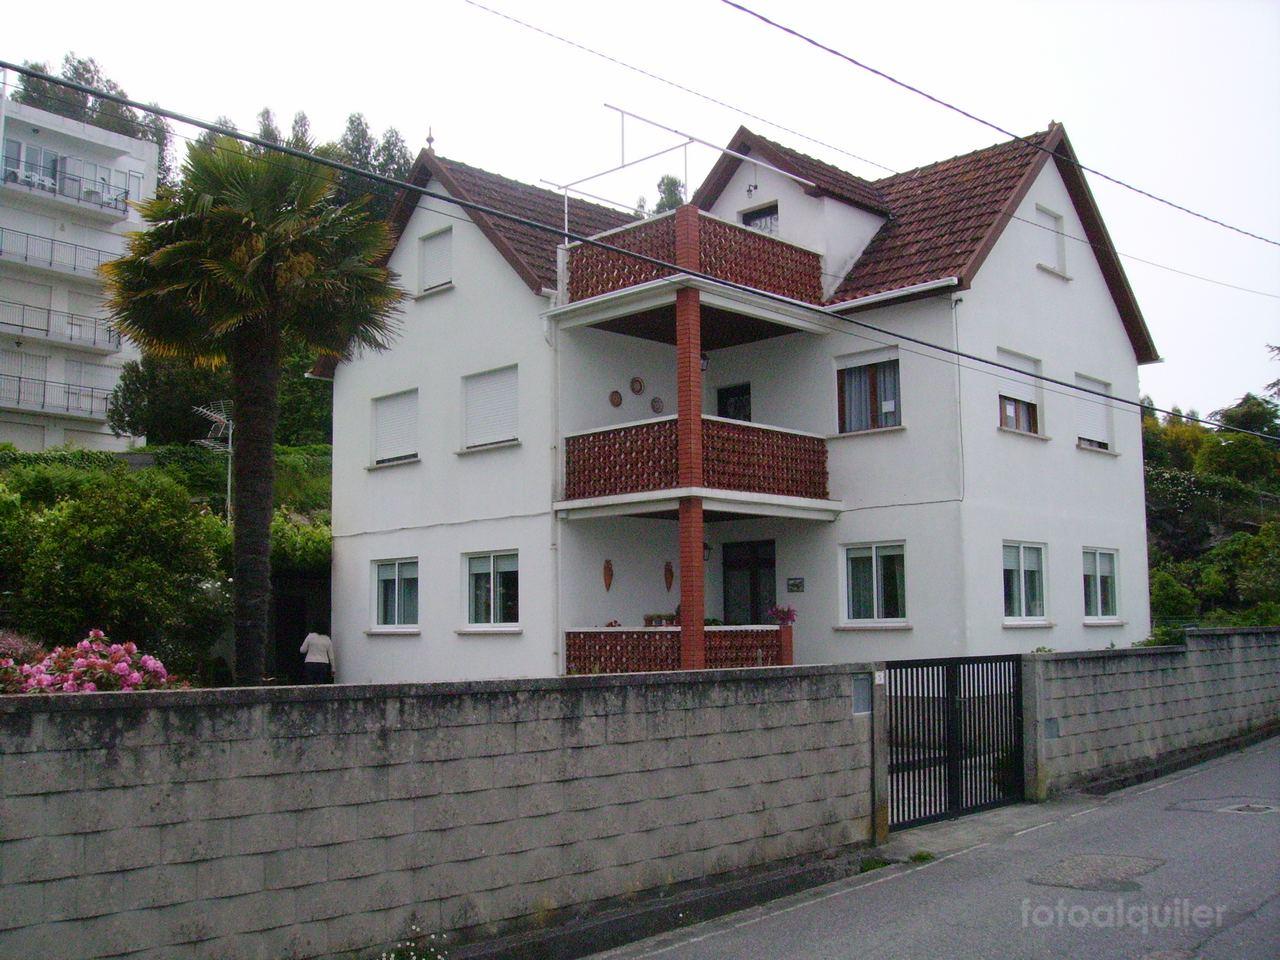 Alquiler de piso en casa con finca, Playa de Beluso, Bueu, Pontevedra, ref.: bueu5531